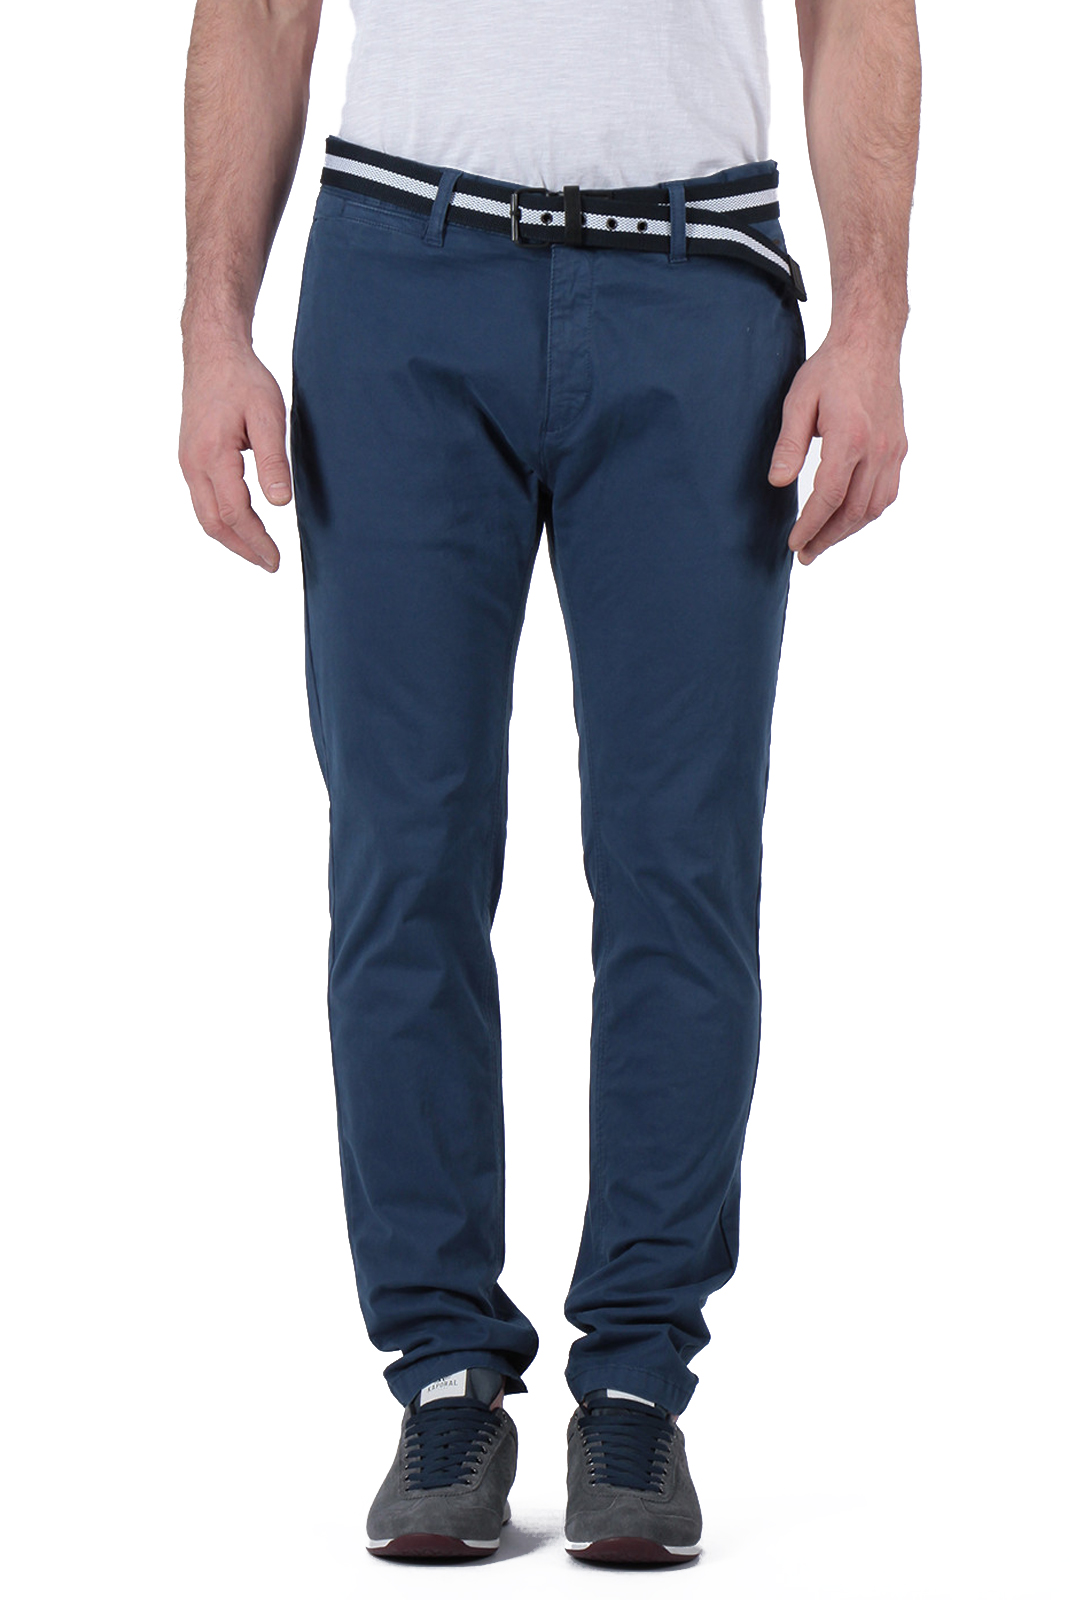 Pantalons chino/citadin  Kaporal ROULA BLUE US